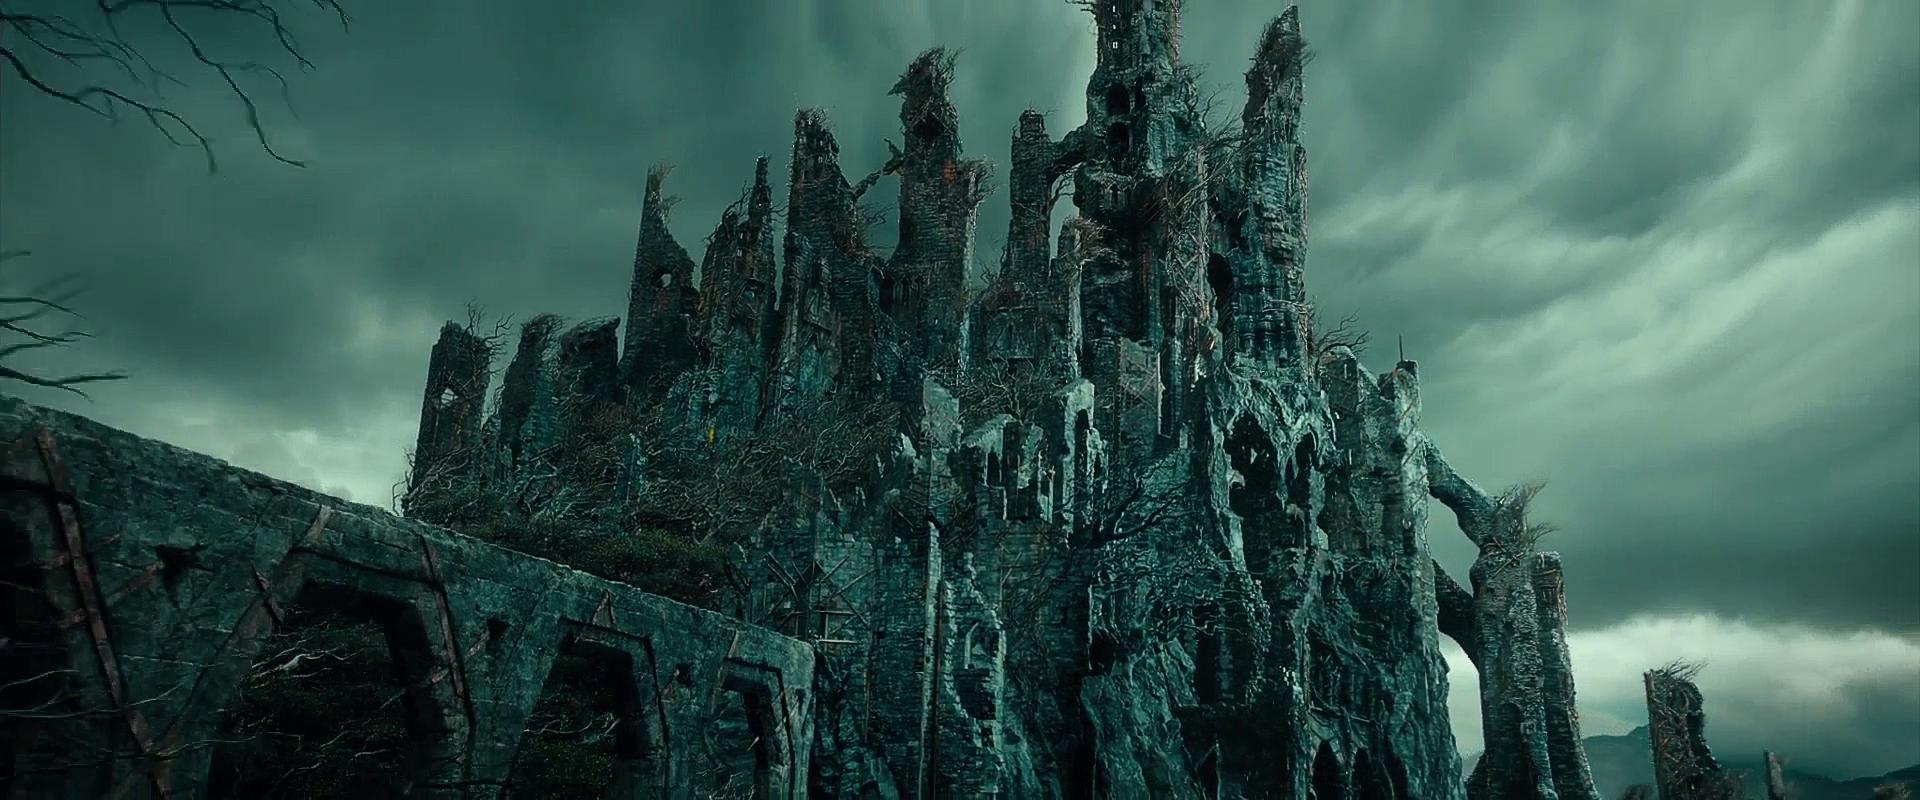 Dol_Guldur_-_An_Unexpected_Journey.PNG